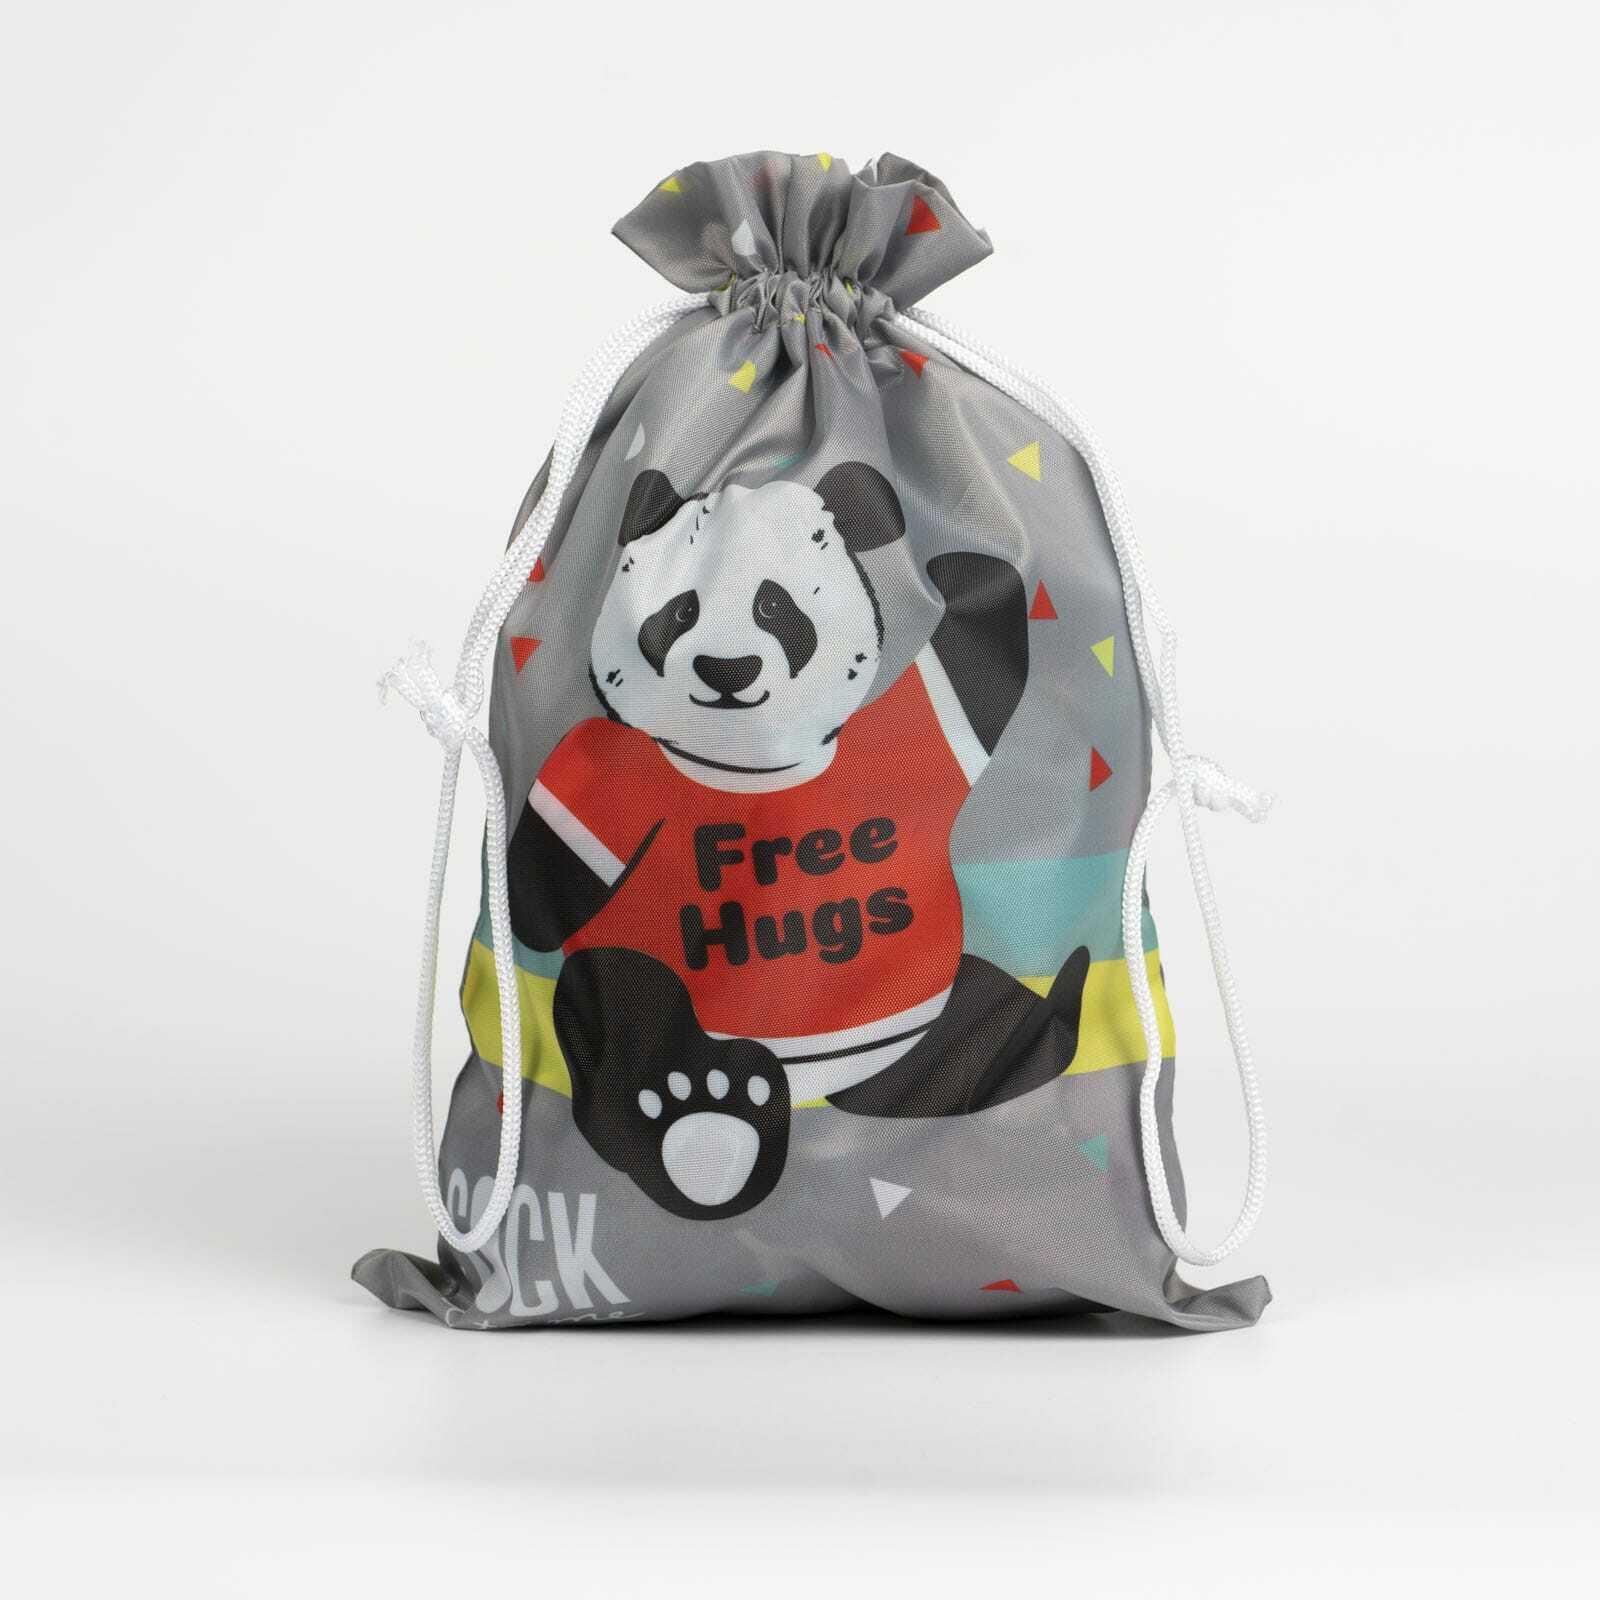 Panda Bear Hug - Cute Animal Grey Gift Bag - Sock It to Me in Grey